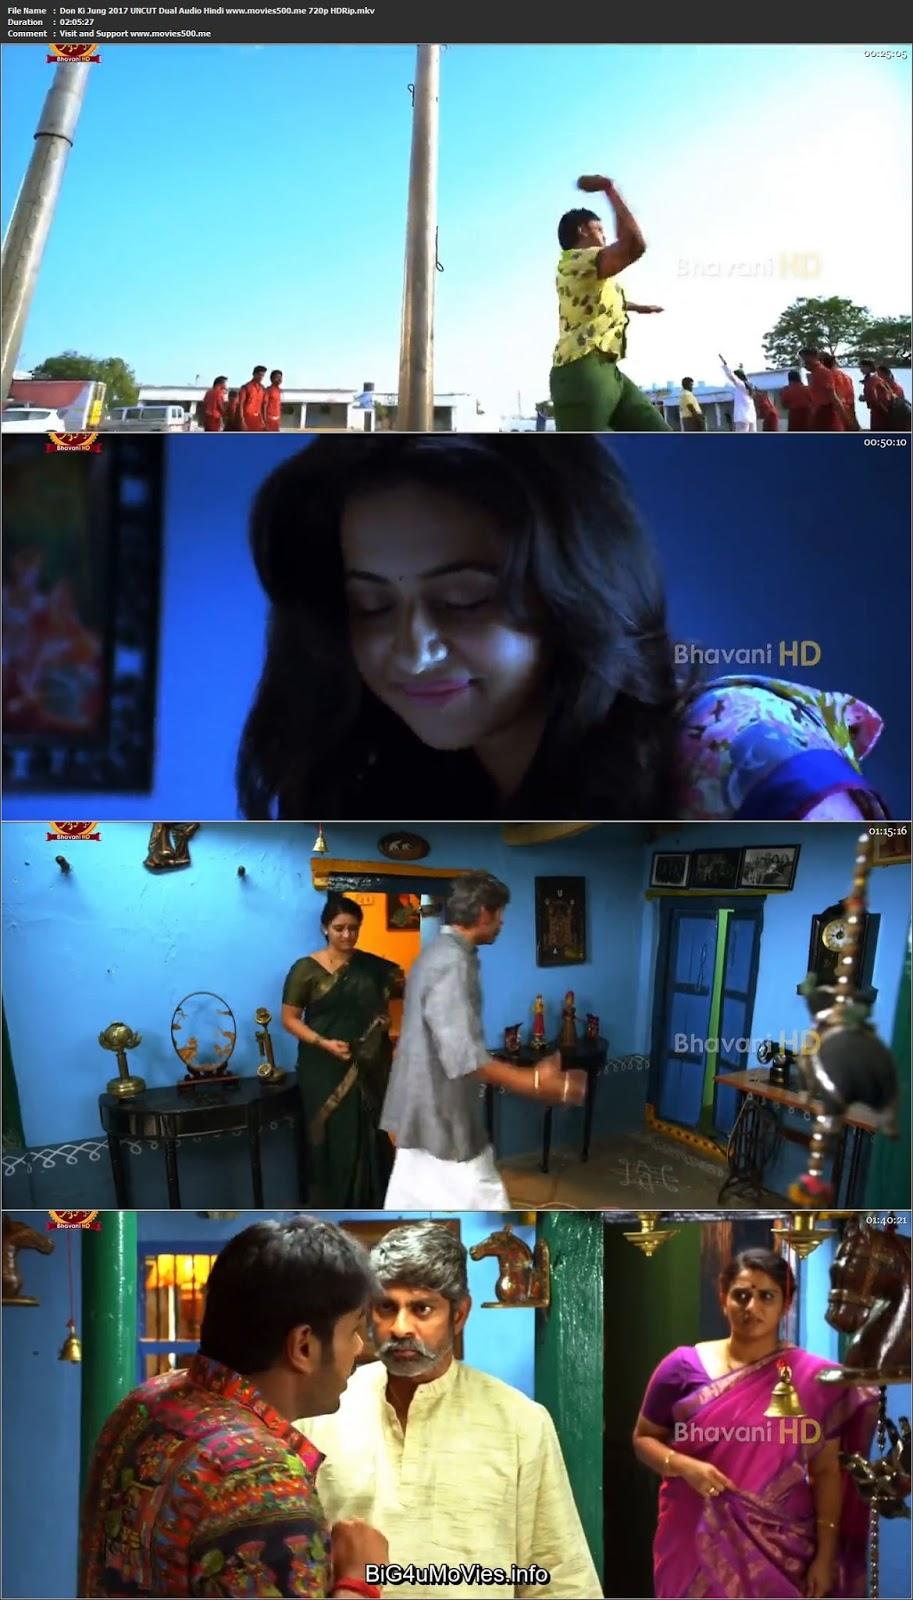 Don Ki Jung 2017 Dual Audio UnCUT Hindi Telugu HDRip 720p at movies500.me